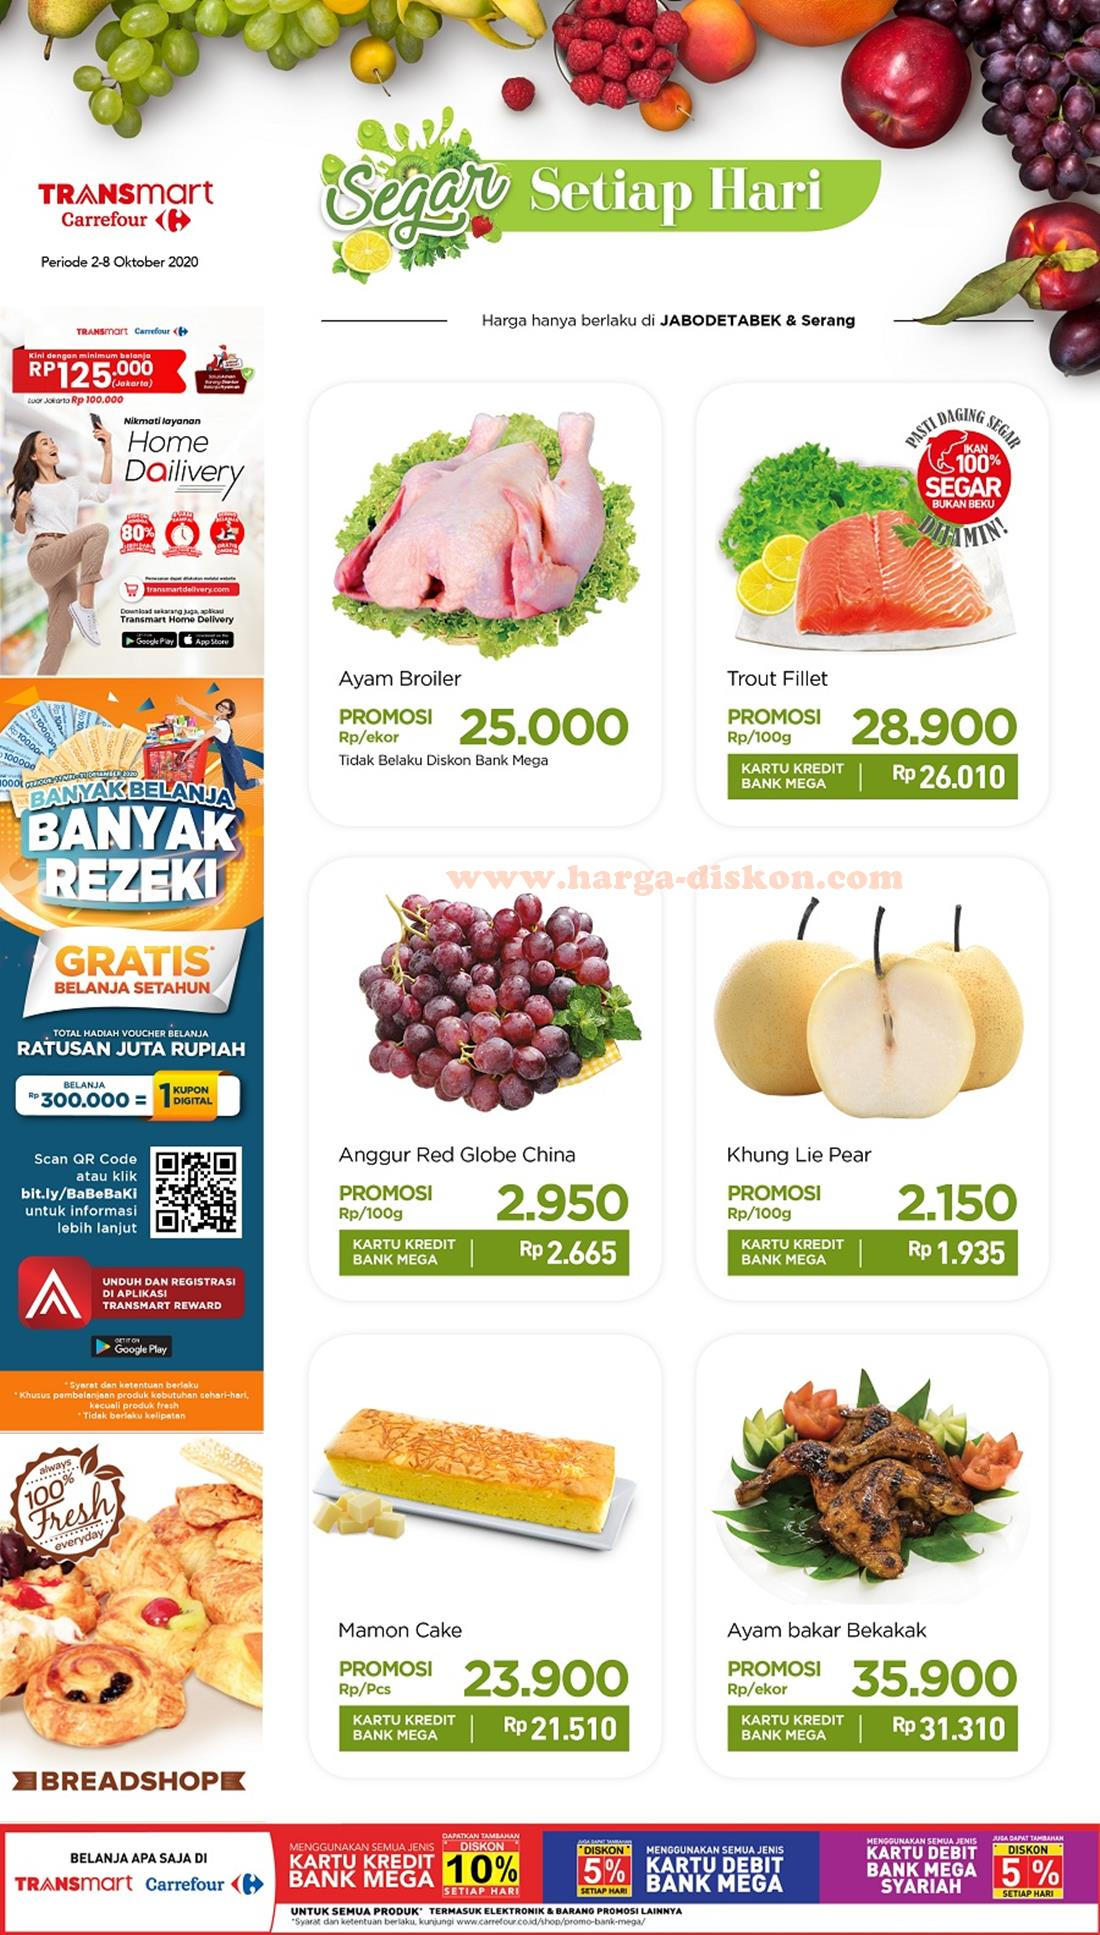 Promo Transmart Carrefour Produk Fresh 2 8 Oktober 2020 Harga Diskon